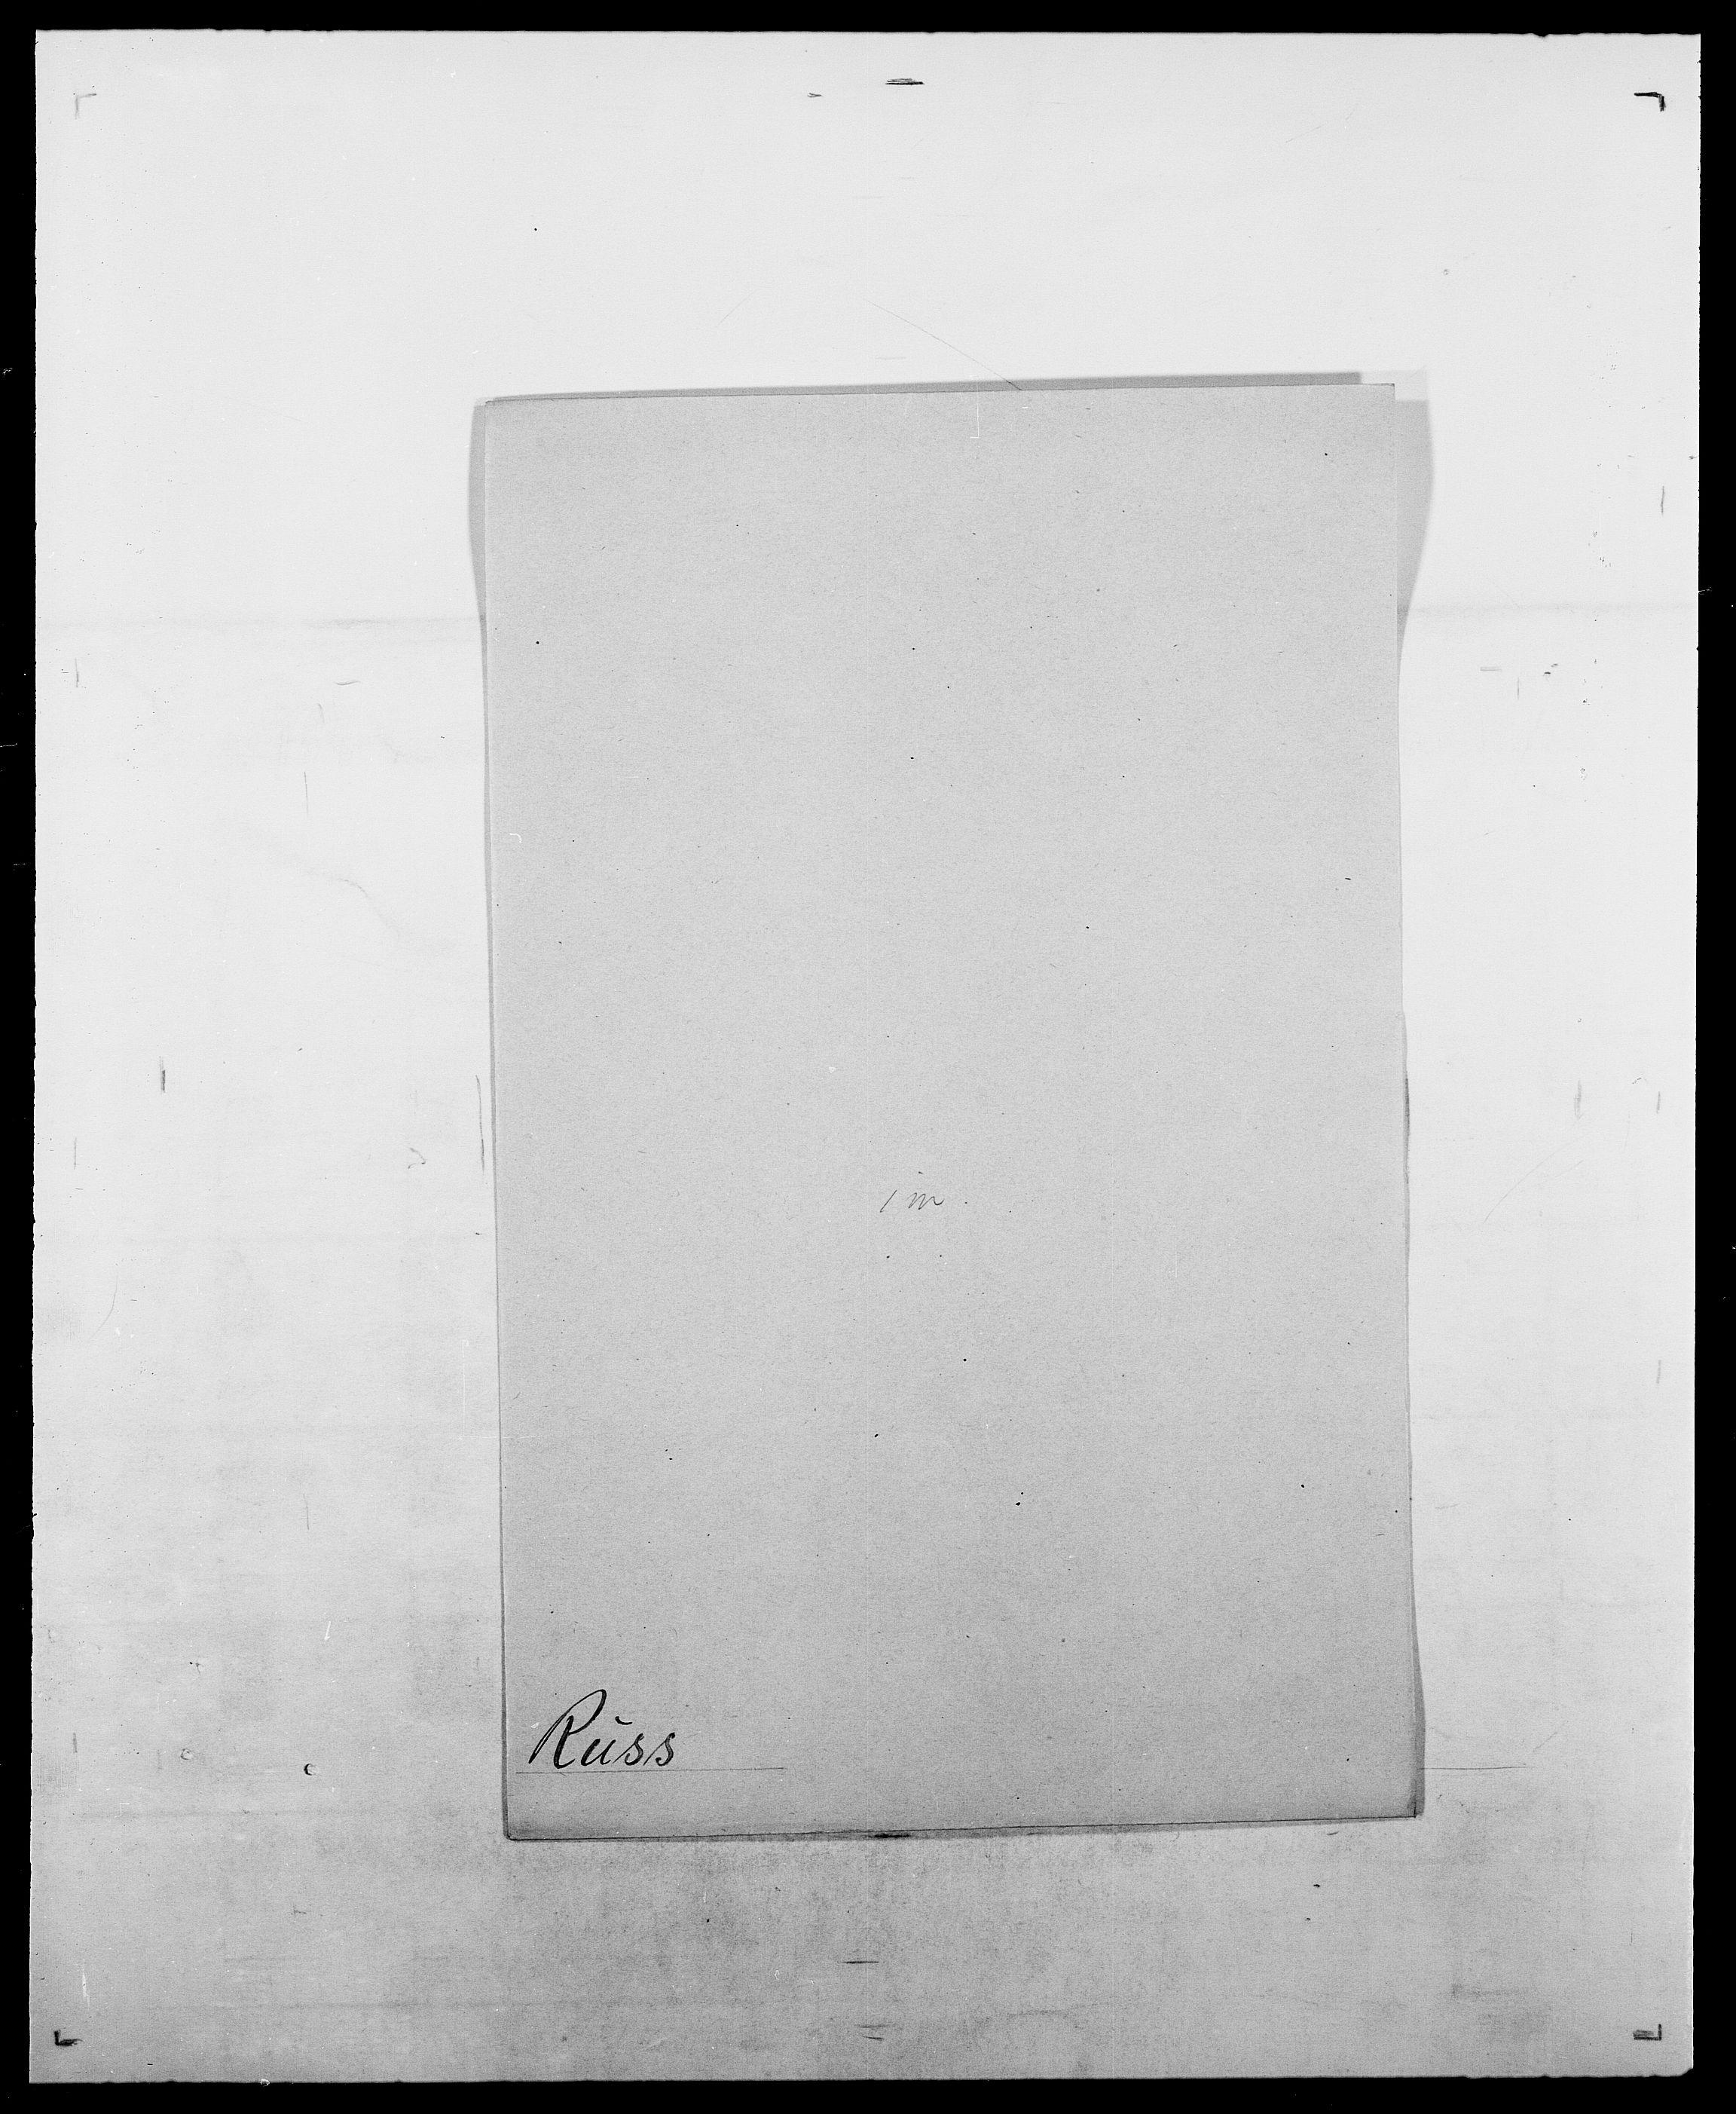 SAO, Delgobe, Charles Antoine - samling, D/Da/L0033: Roald - Røyem, s. 474